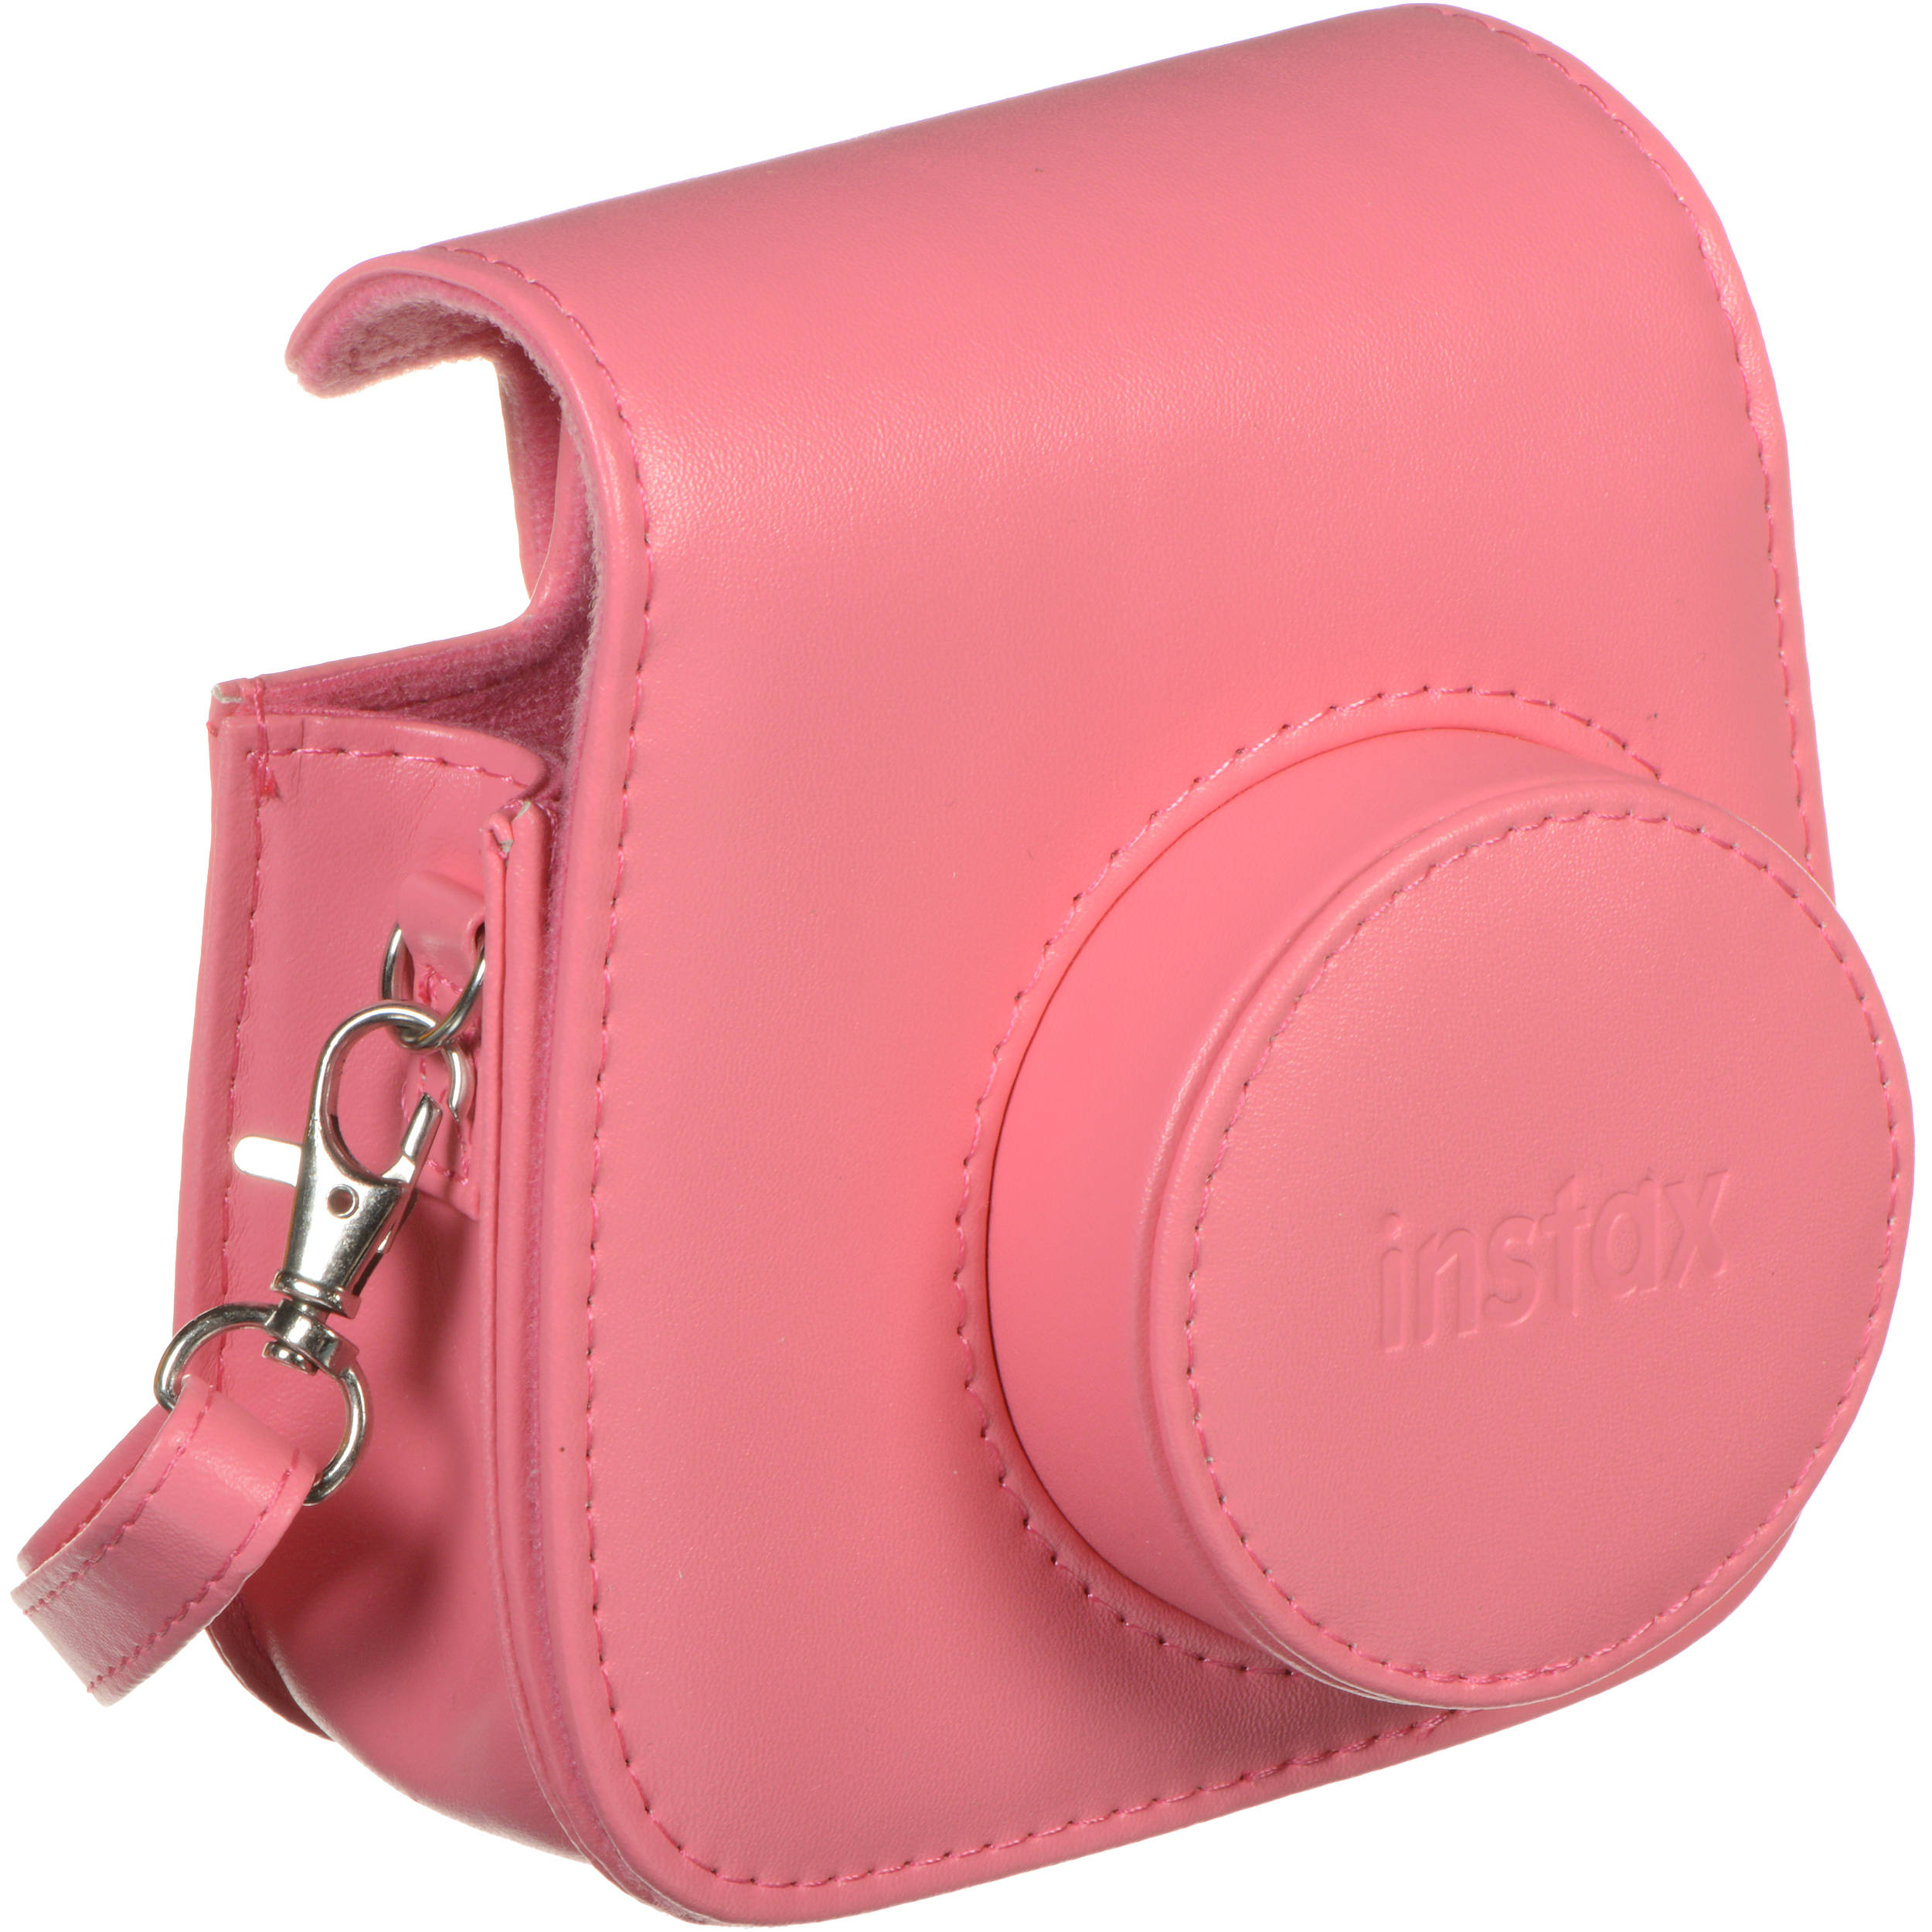 new concept 82dec 59934 FUJIFILM Groovy Camera Case for instax mini 9 (Flamingo Pink)